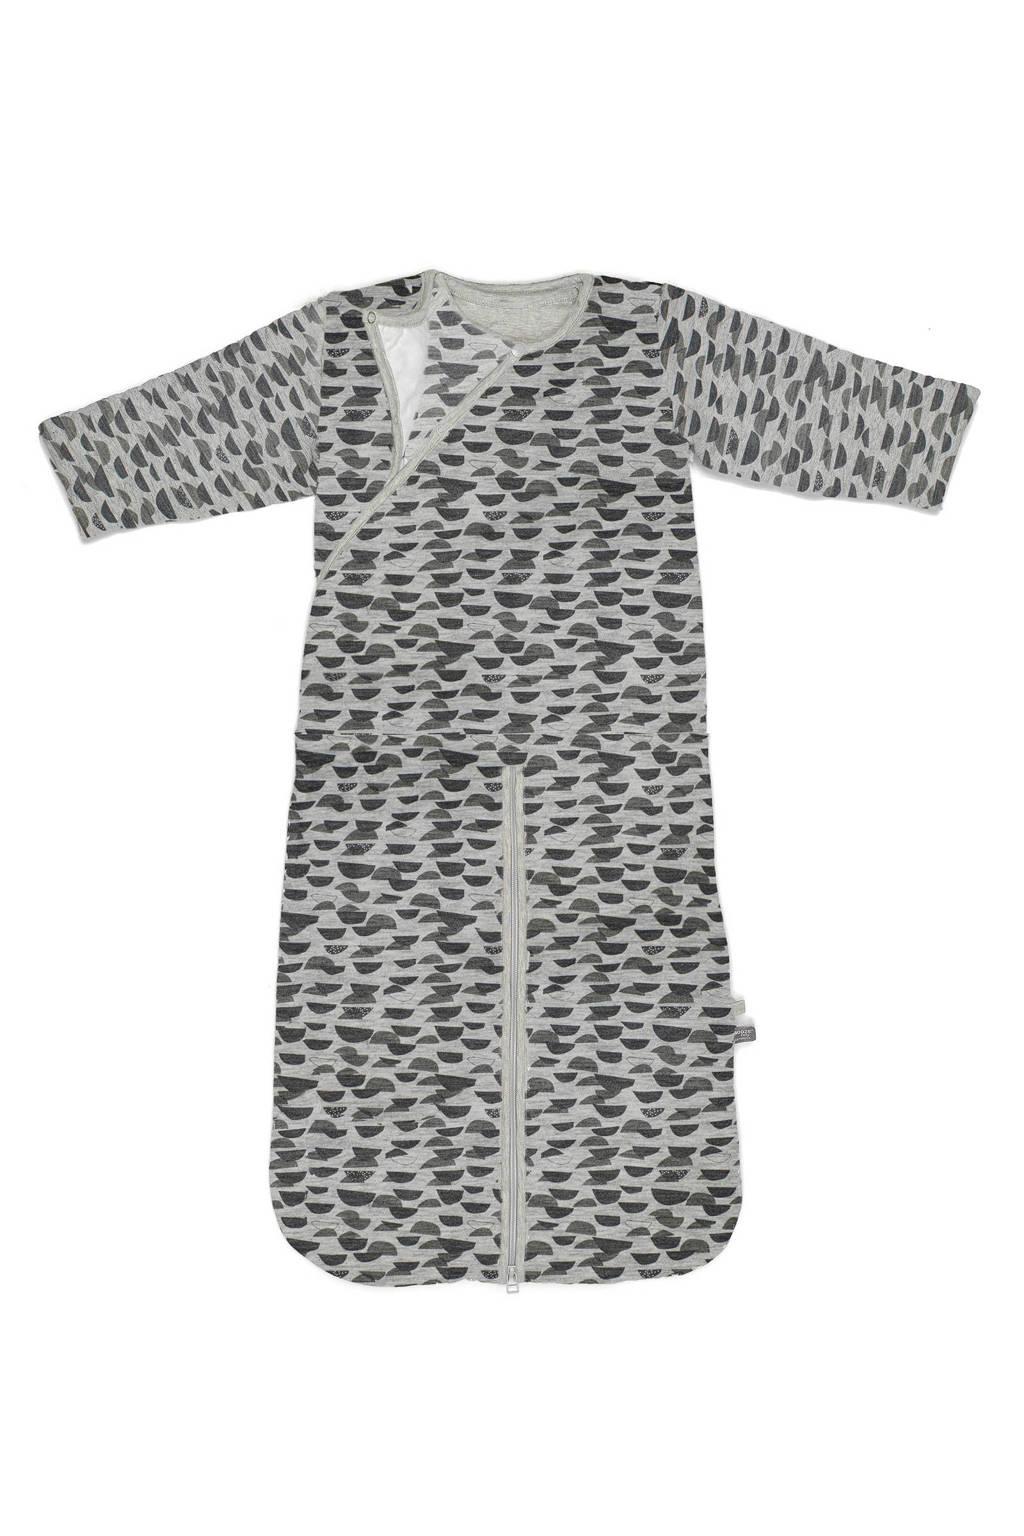 Snoozebaby baby slaapzak 4 seizonen 3-9 Frost Grey, 3-9 maand